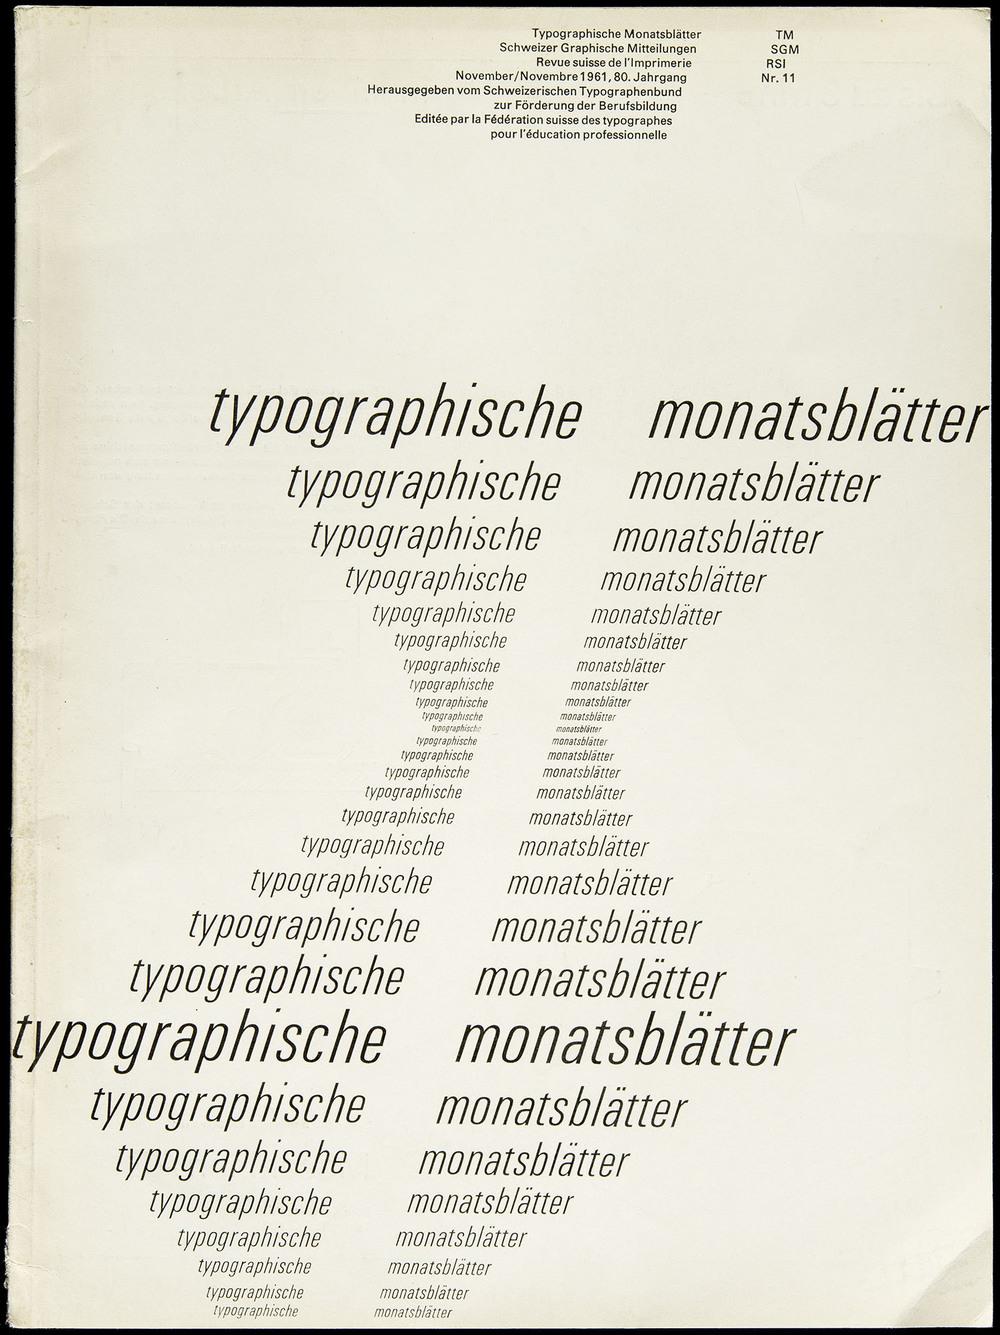 Emil Ruder,  Typographische Monatsblätter November 1961 , Zollikofer & Co., St. Gallen, 23 x 31 cm